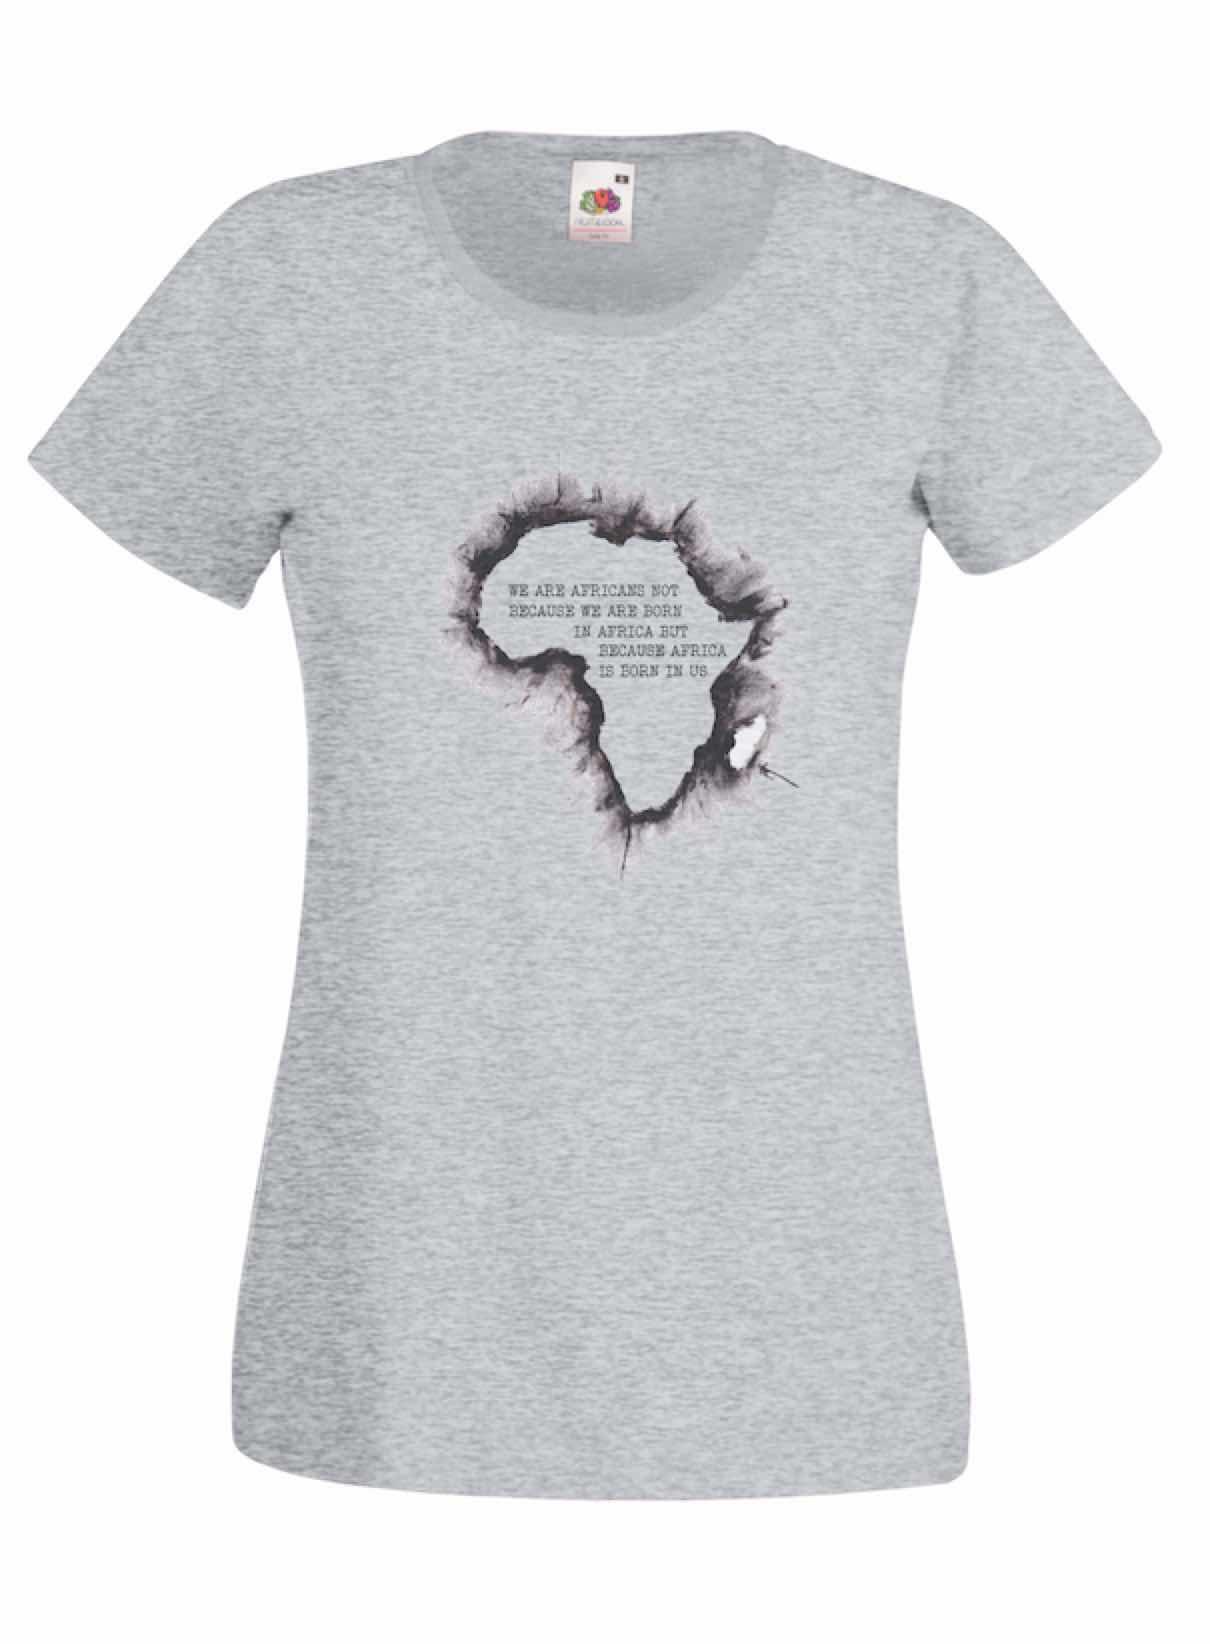 Born design for t-shirt, hoodie & sweatshirt